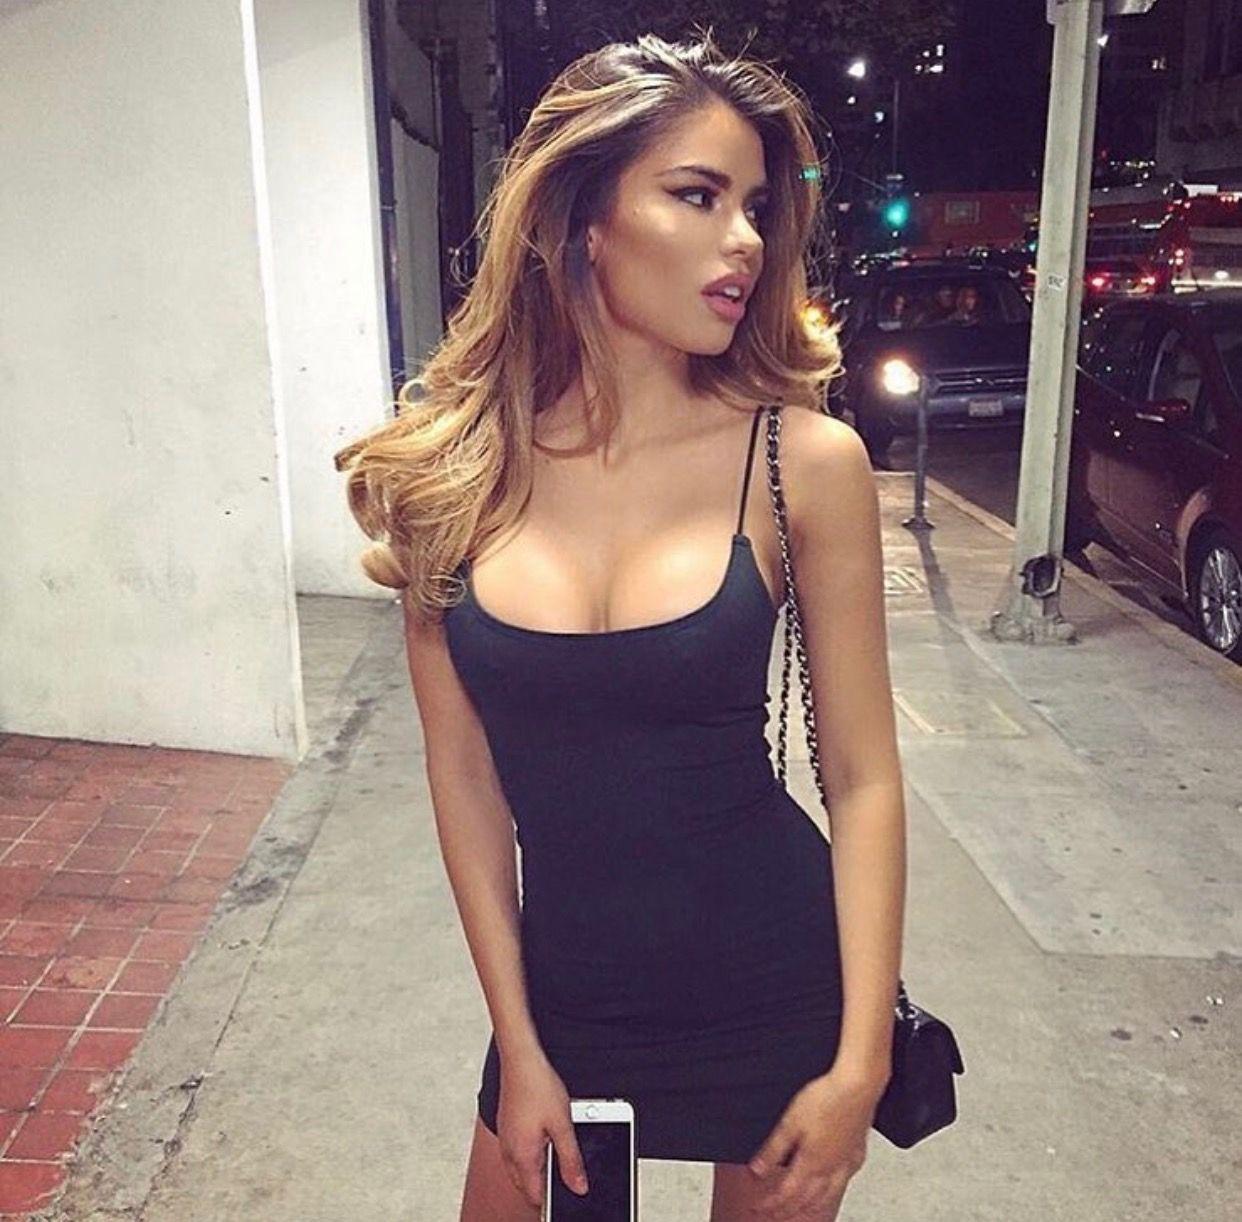 Skinny brunette model tight little black dress sexy fotous